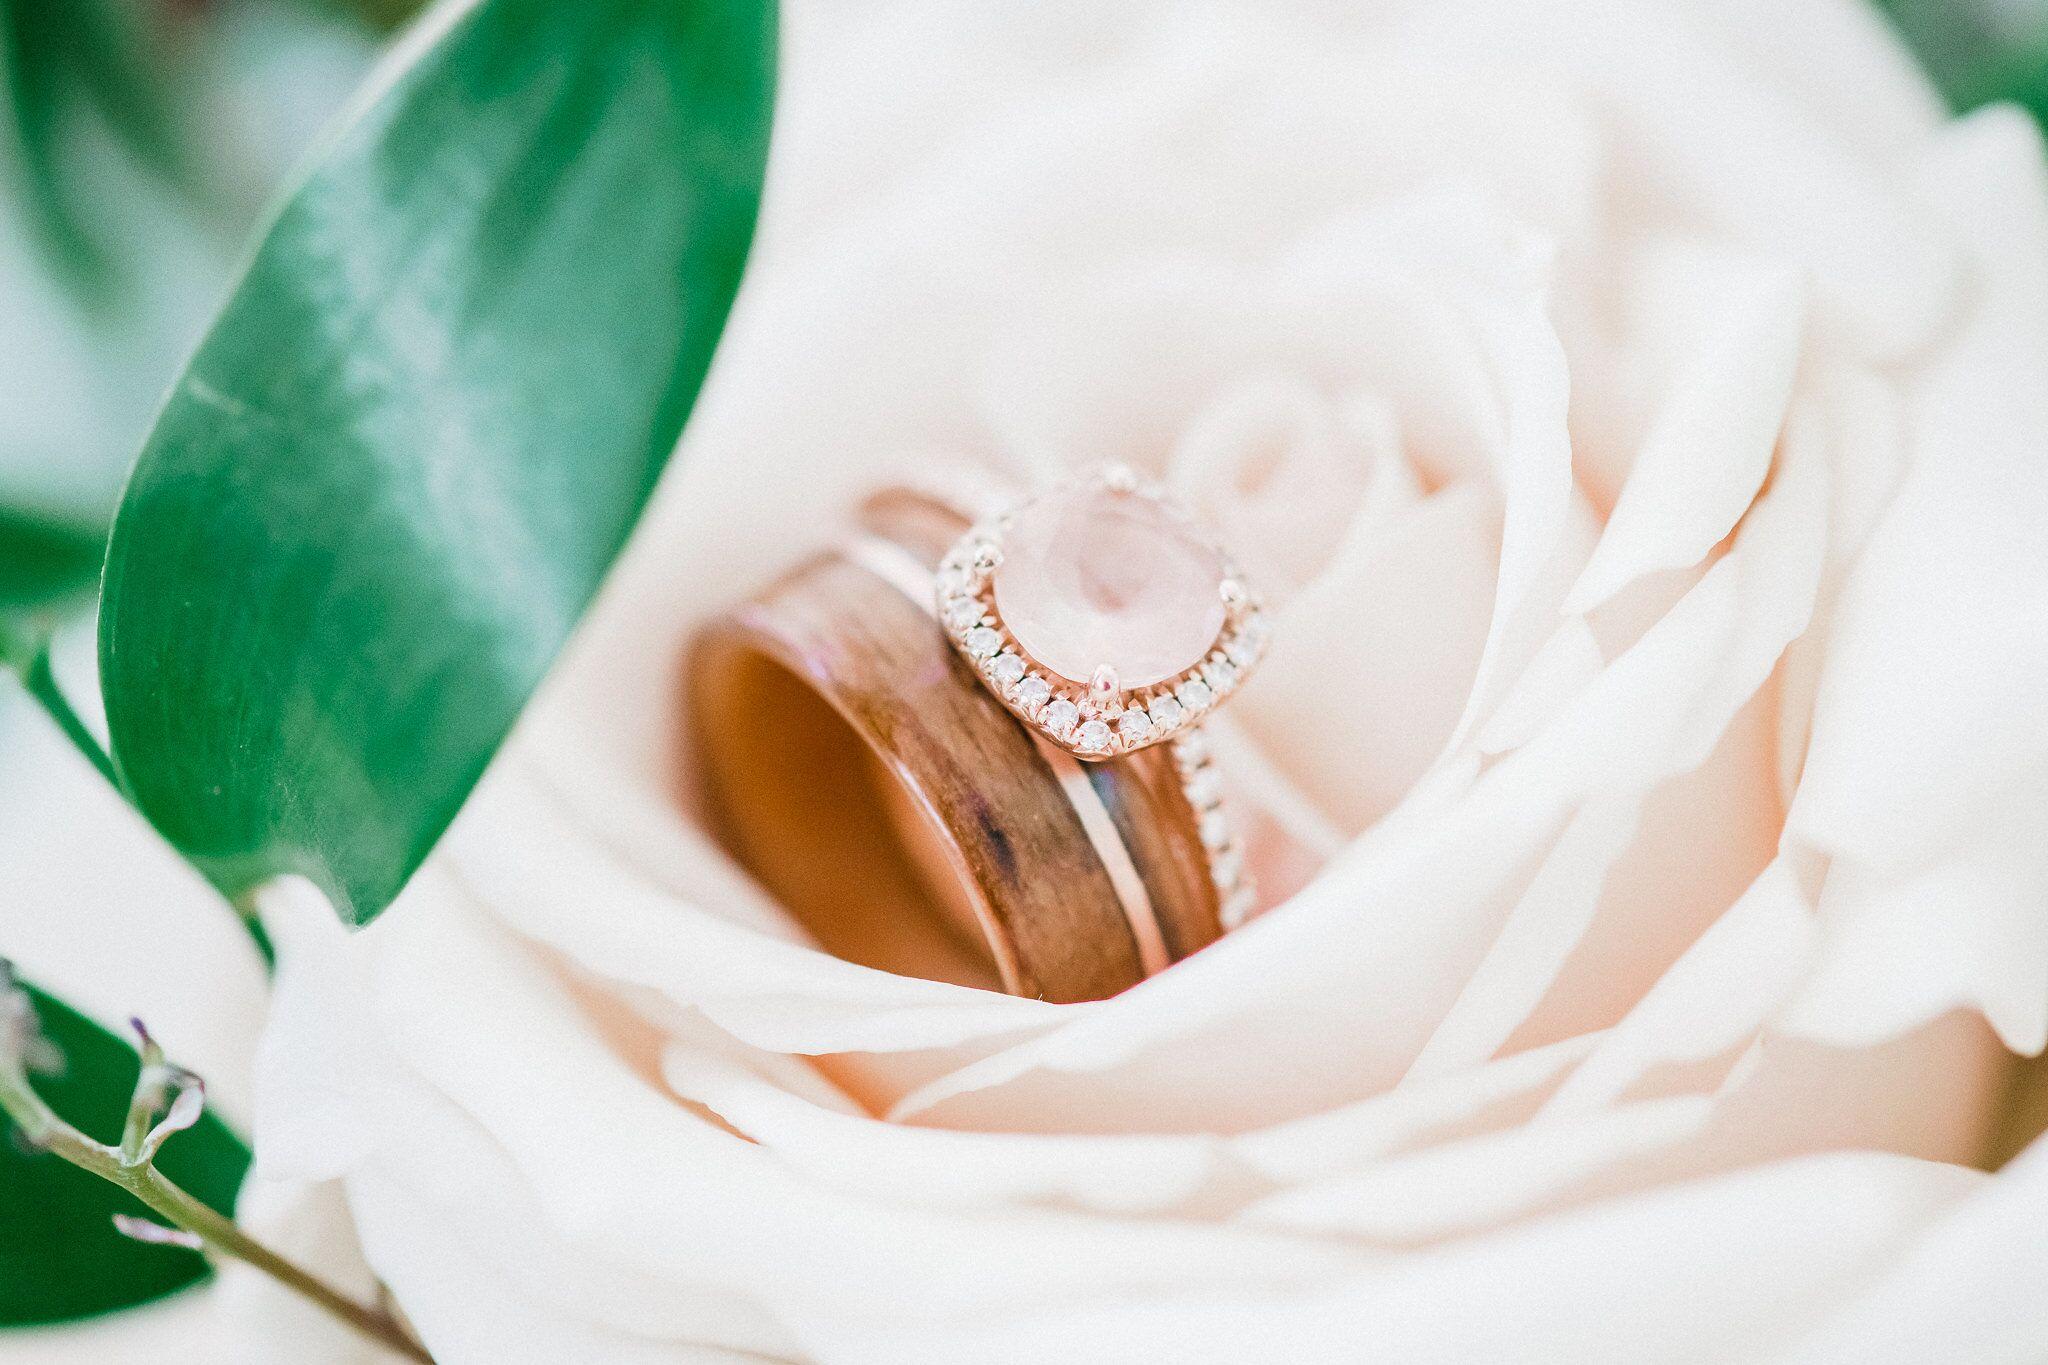 www.santabarbaraweddings.com | Photographer: Grace Kathryn | Venues: Villa & Vine, Santa Barbara Courthouse, Hilton Santa Barbara Resort | Coordination: Burlap & Bordeaux | Wedding Rings